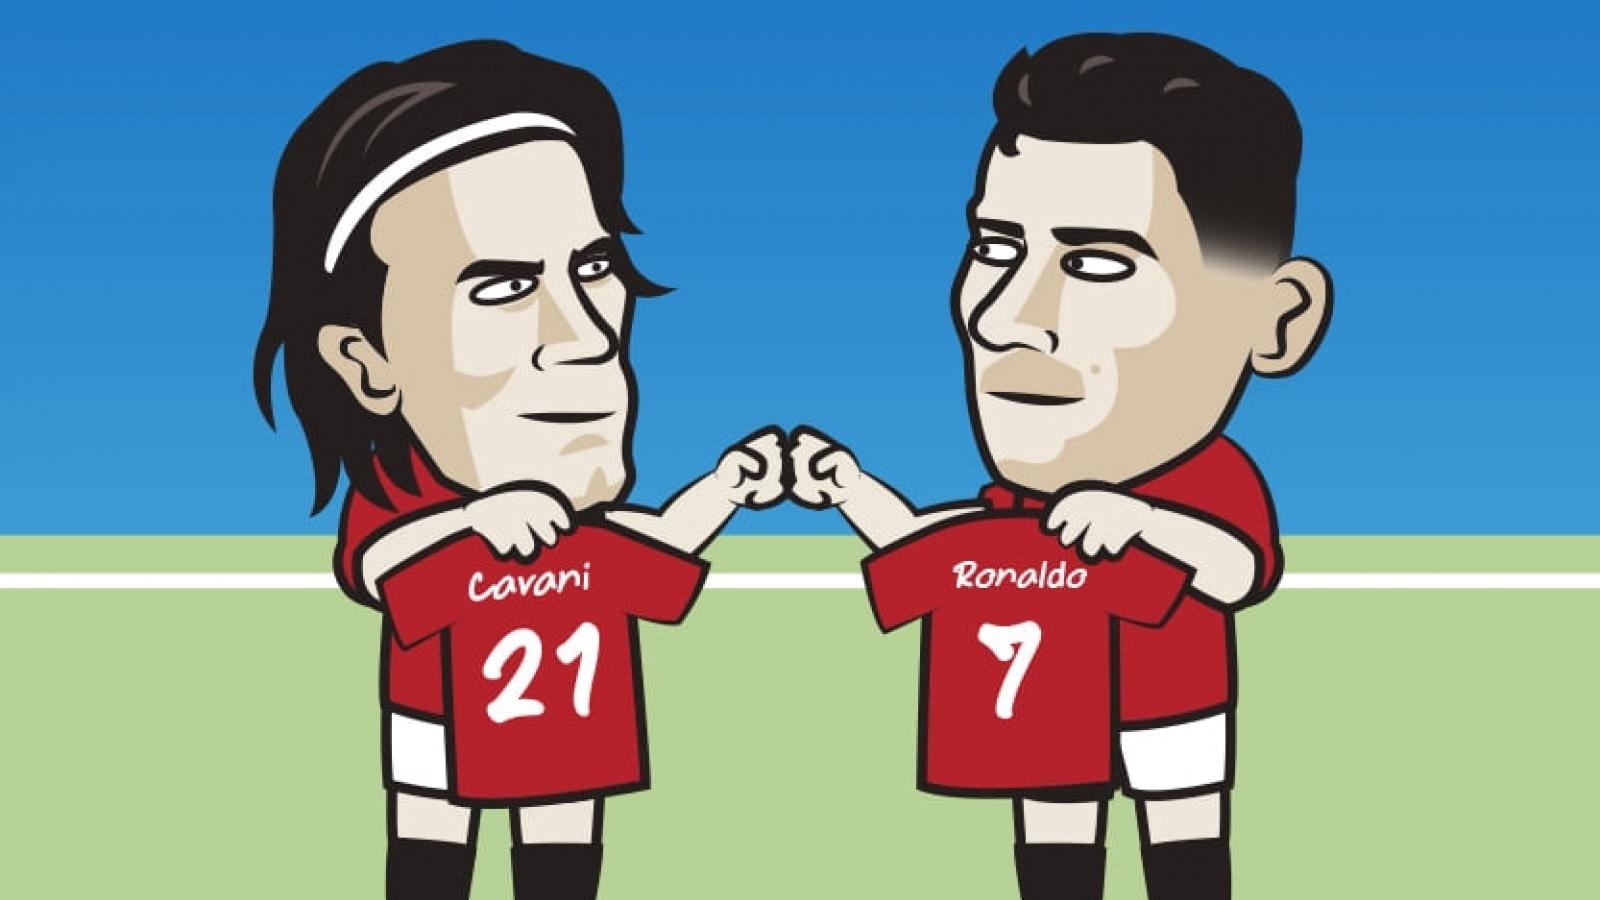 Biếm hoạ 24h: Edinson Cavani chơi đẹp với Cristiano Ronaldo